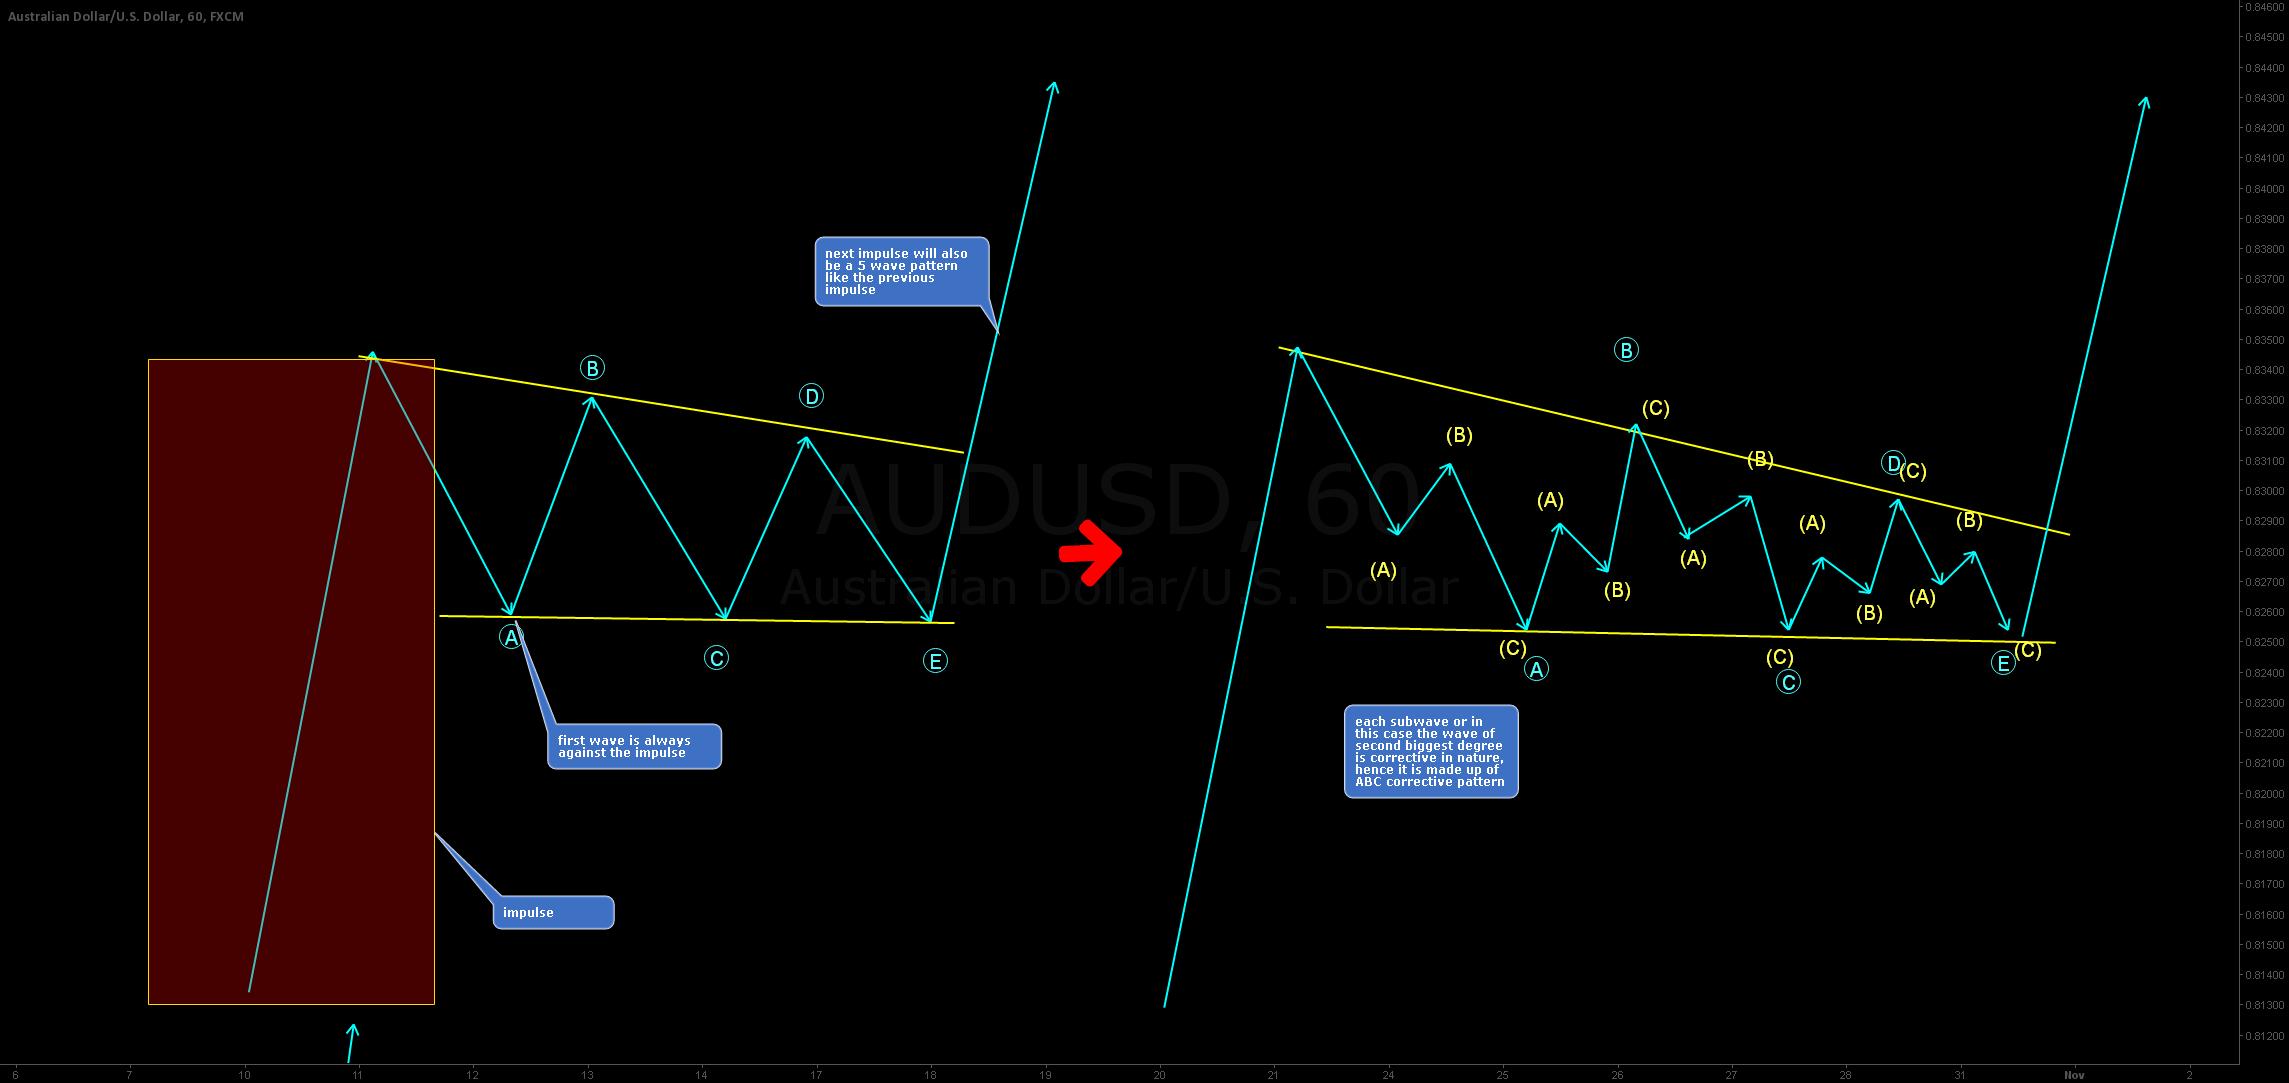 Structure analysis - Bullish triangle